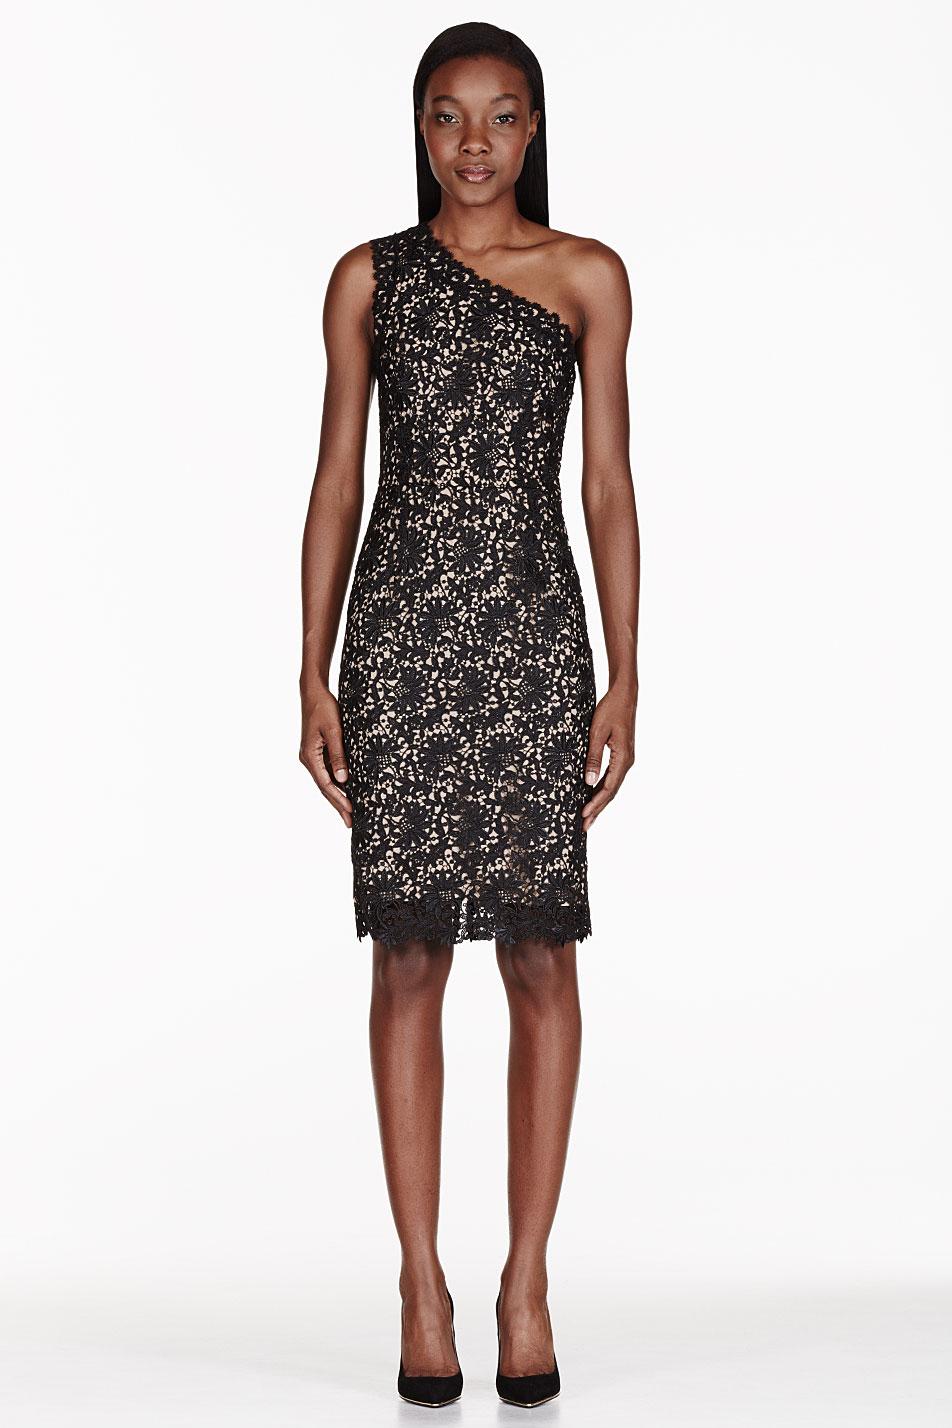 One Shoulder Black Lace Dresses